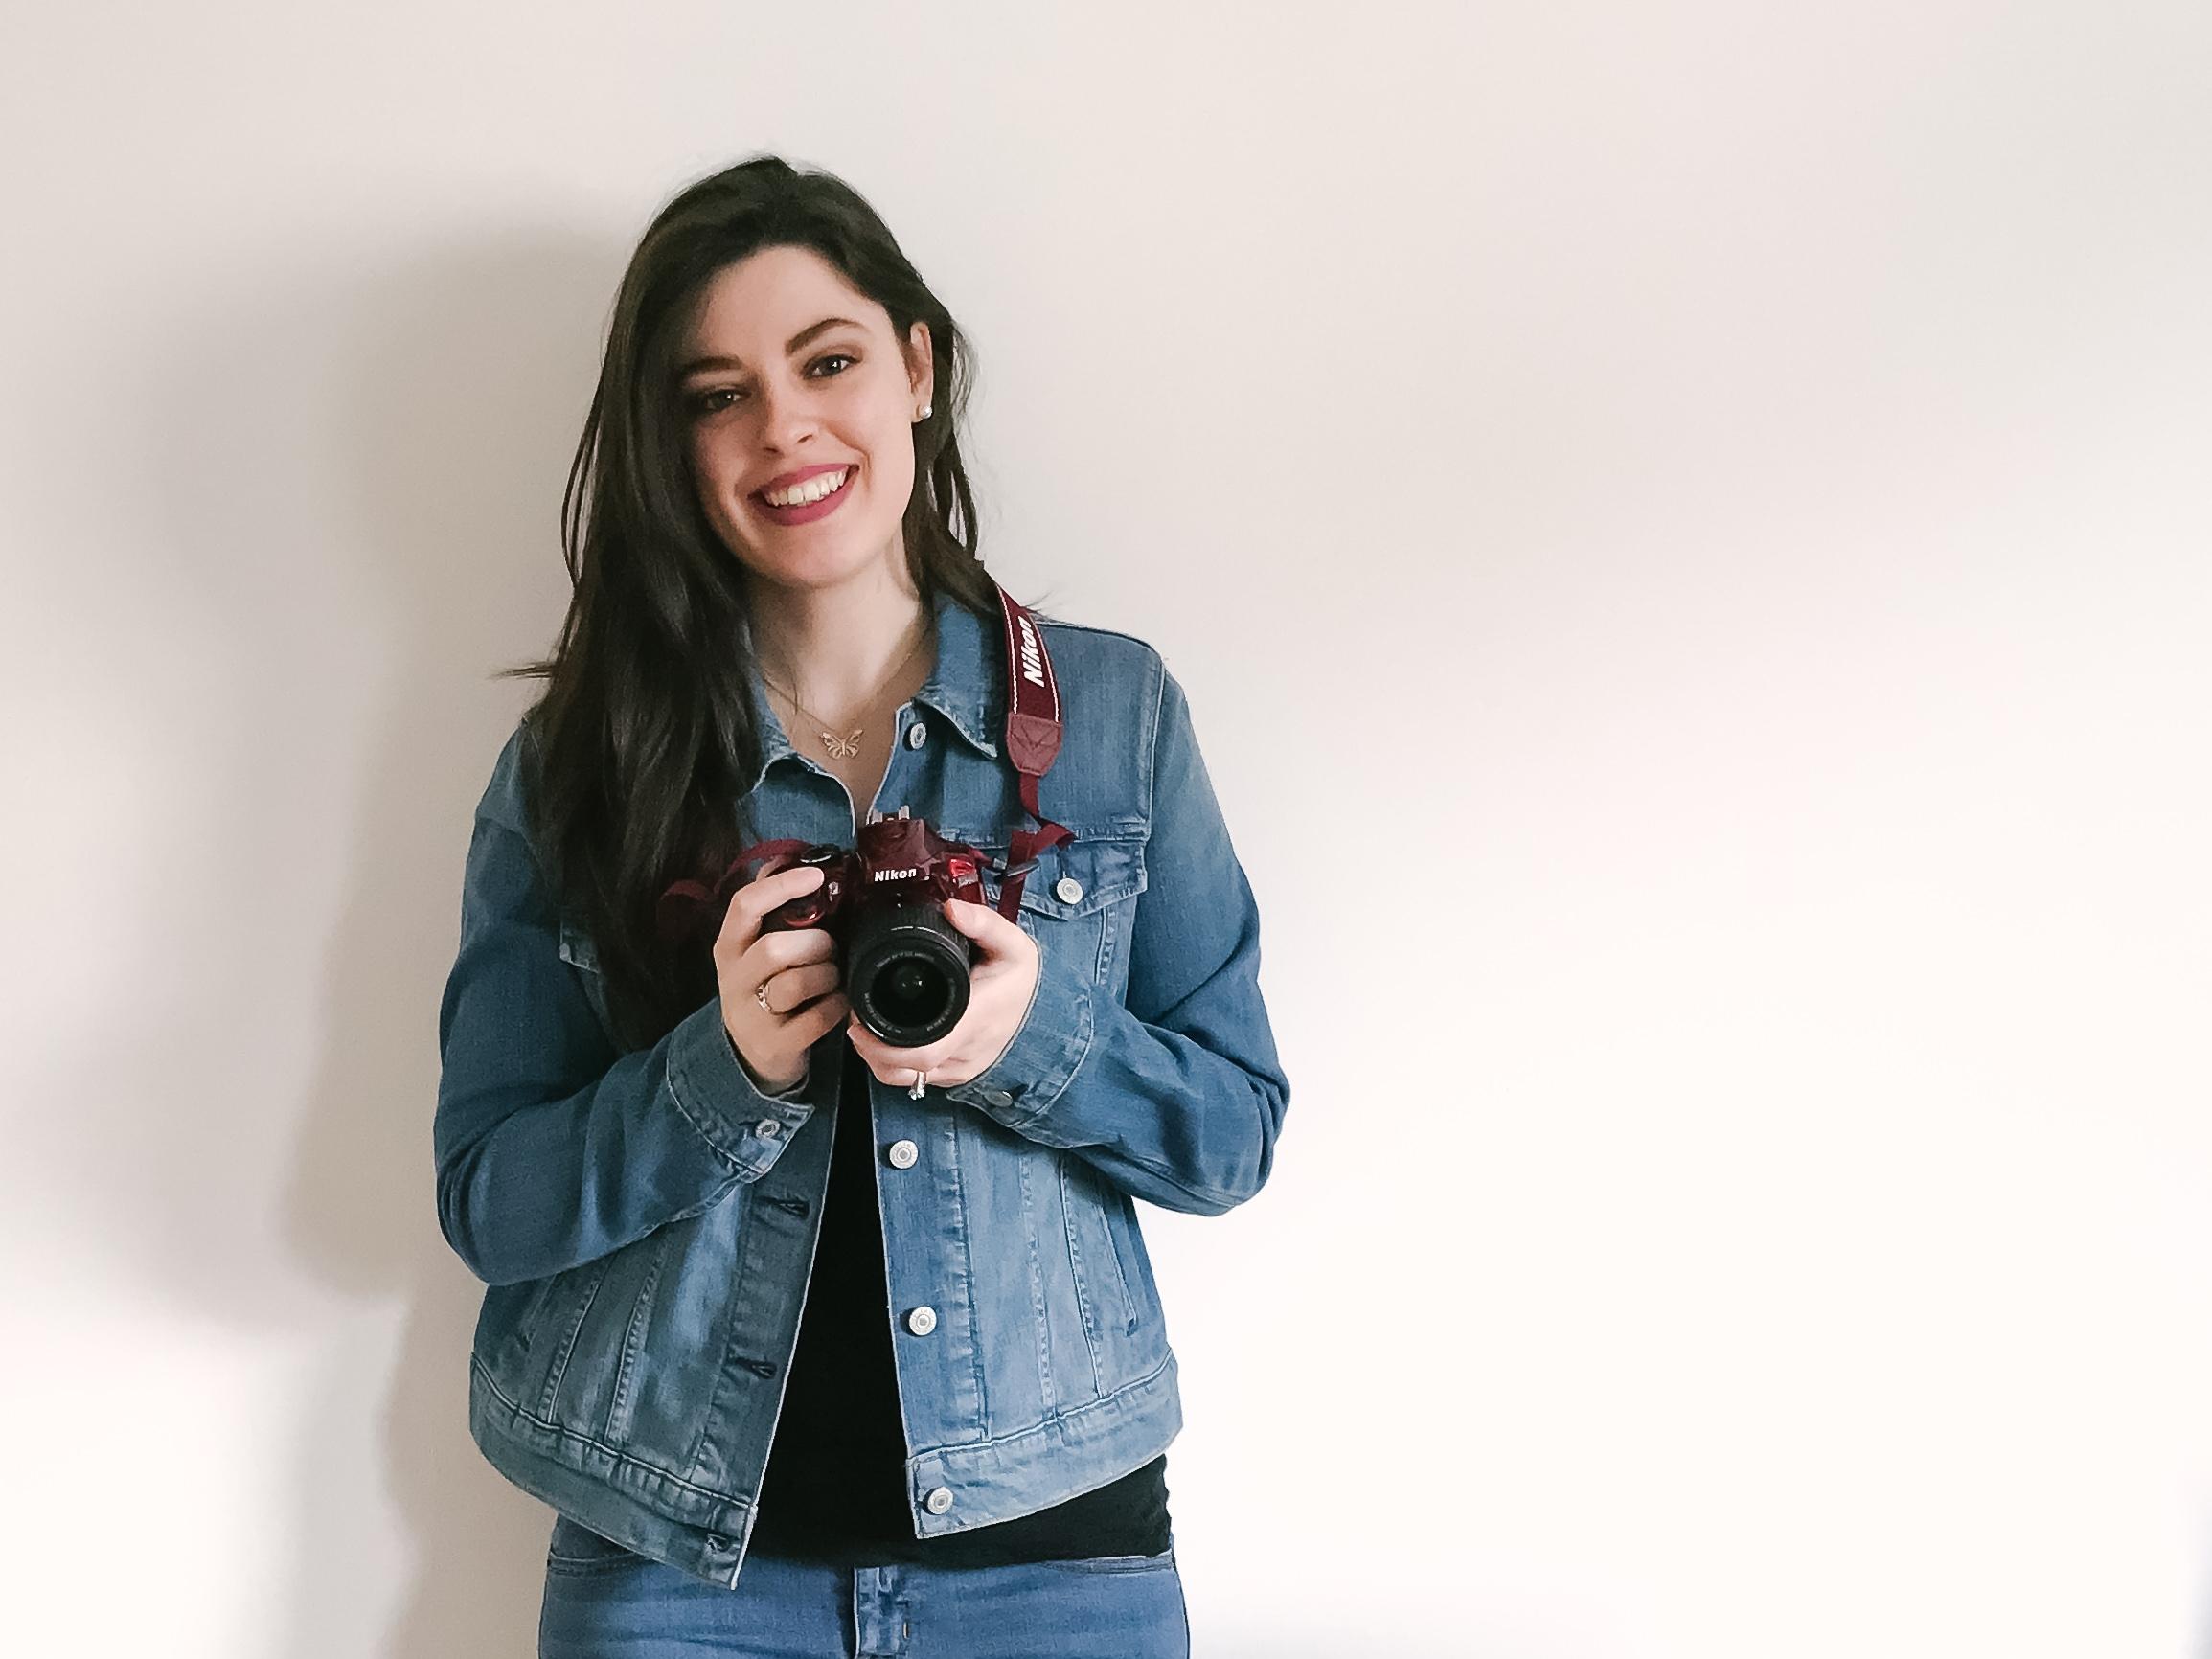 Sara Jones - Artist, Photographer, Traveler, Army Spouse, & much more.